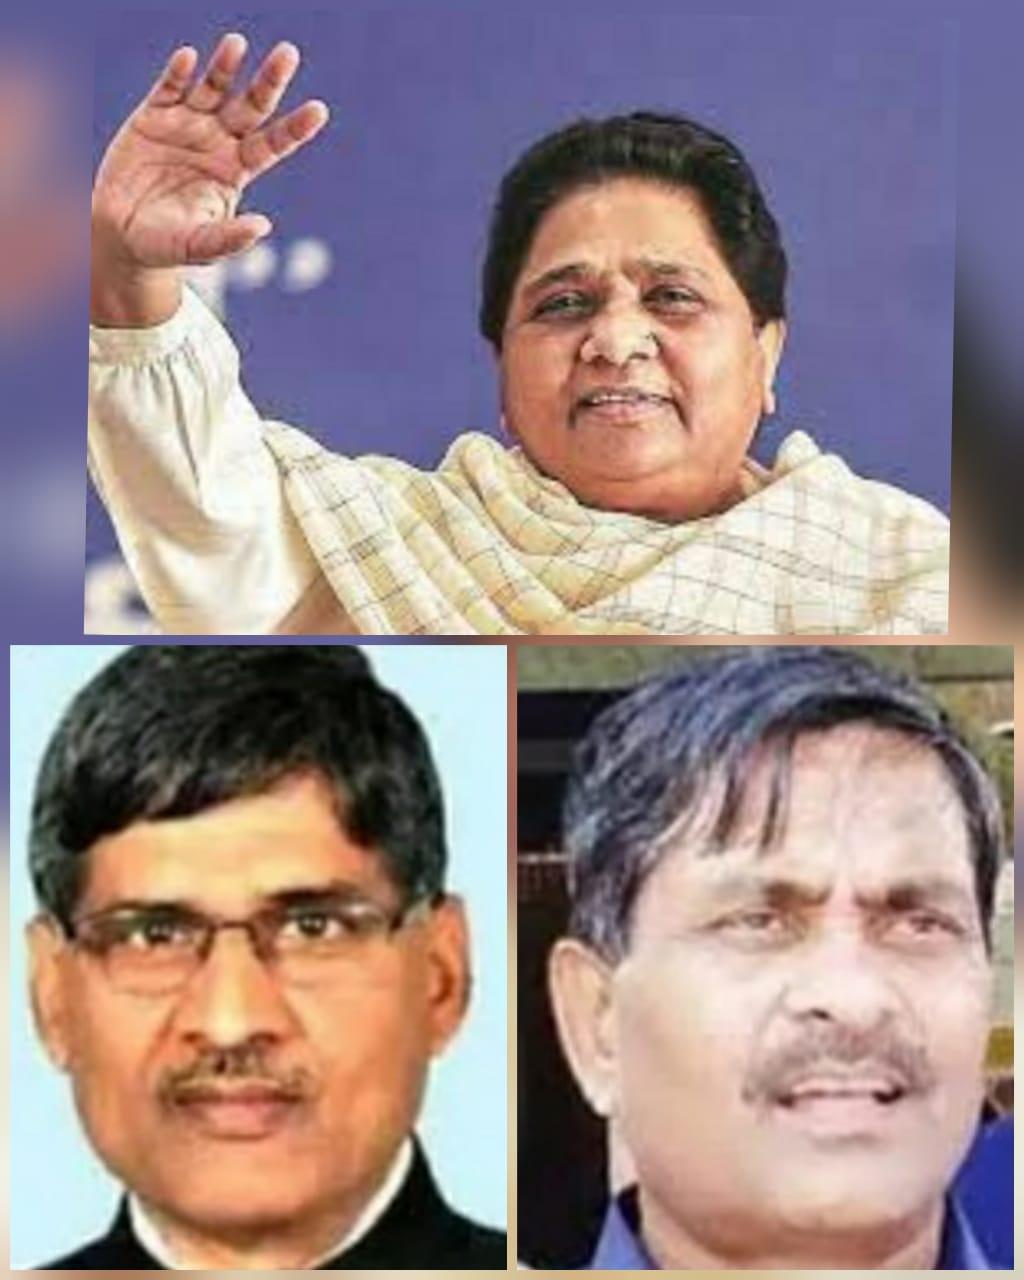 मायावती ने लालजी वर्मा, राम अचल राजभर को पार्टी से बाहर का दिखाया रास्ता